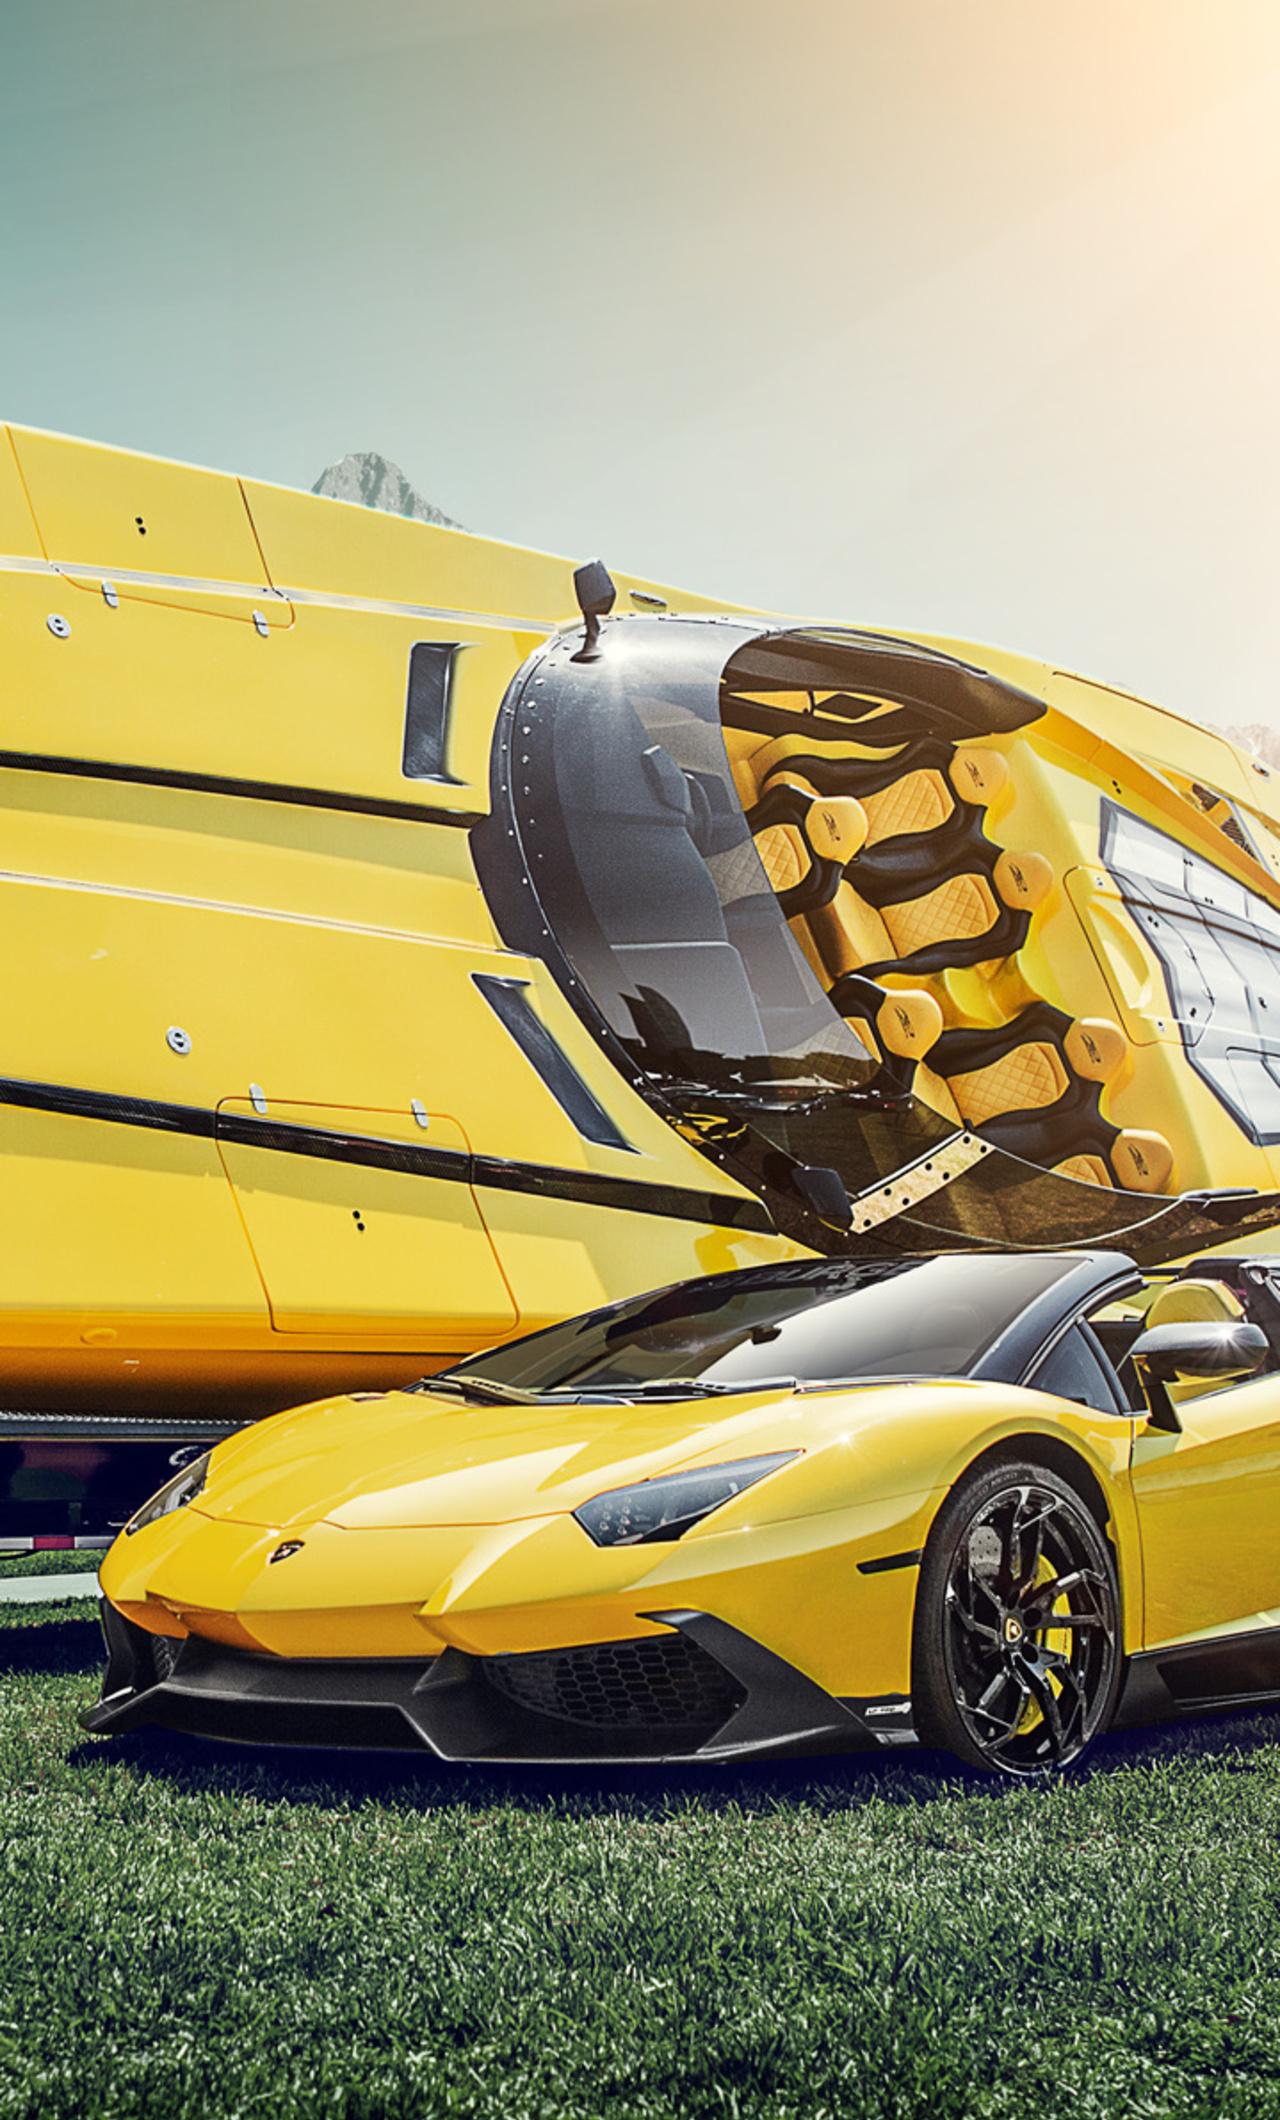 1280x2120 Lamborghini And Boat Iphone 6 Hd 4k Wallpapers Images